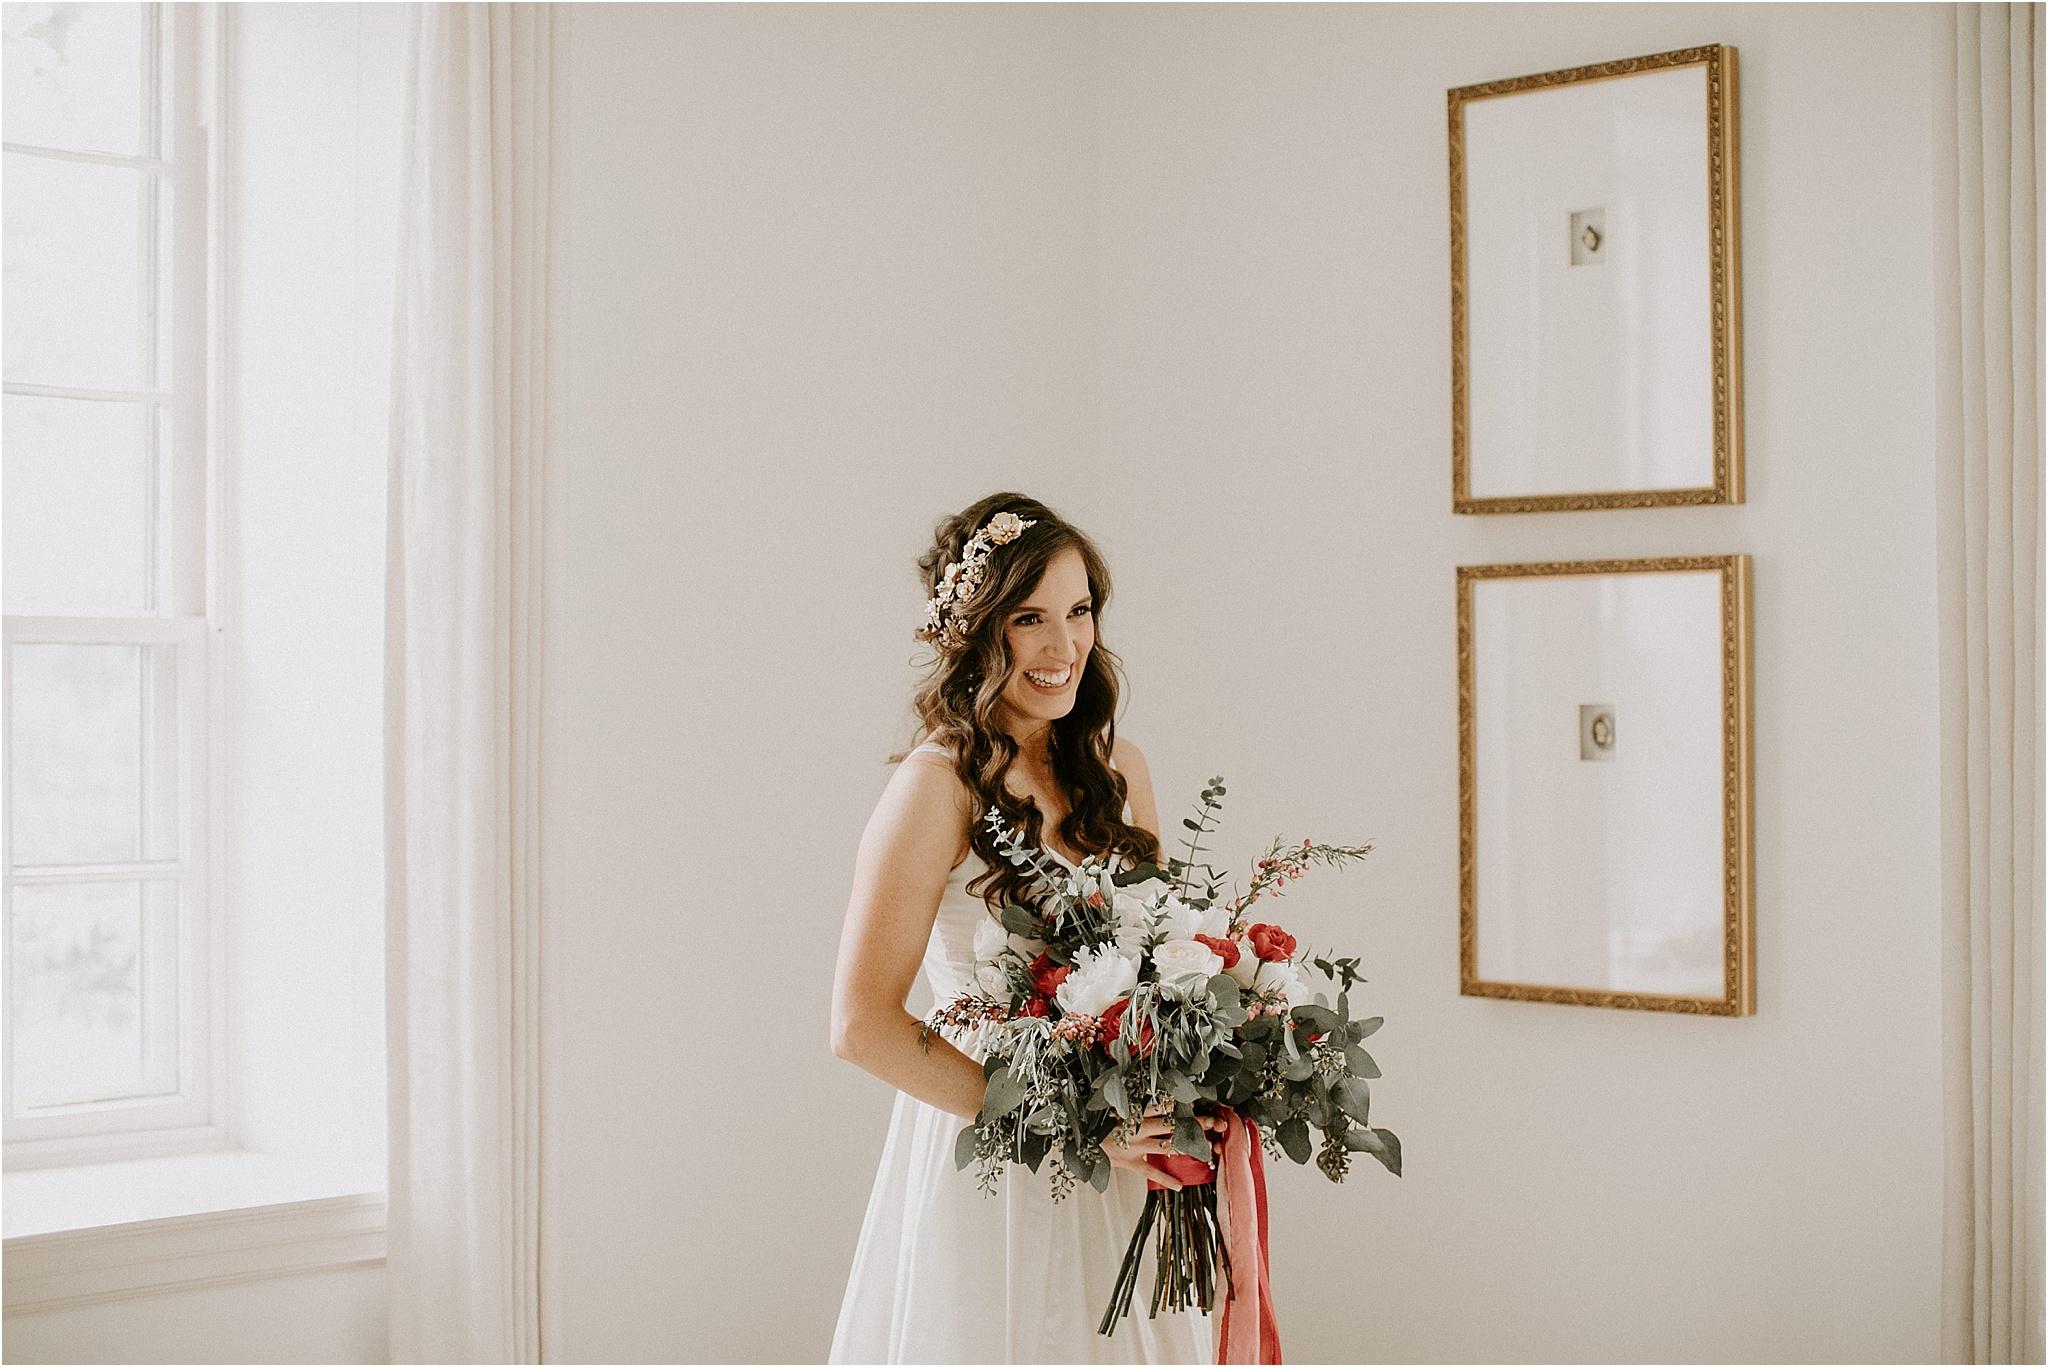 Sarah_Brookhart_Farm_at_Eagles_Ridge_Wedding_Photographer_0017.jpg